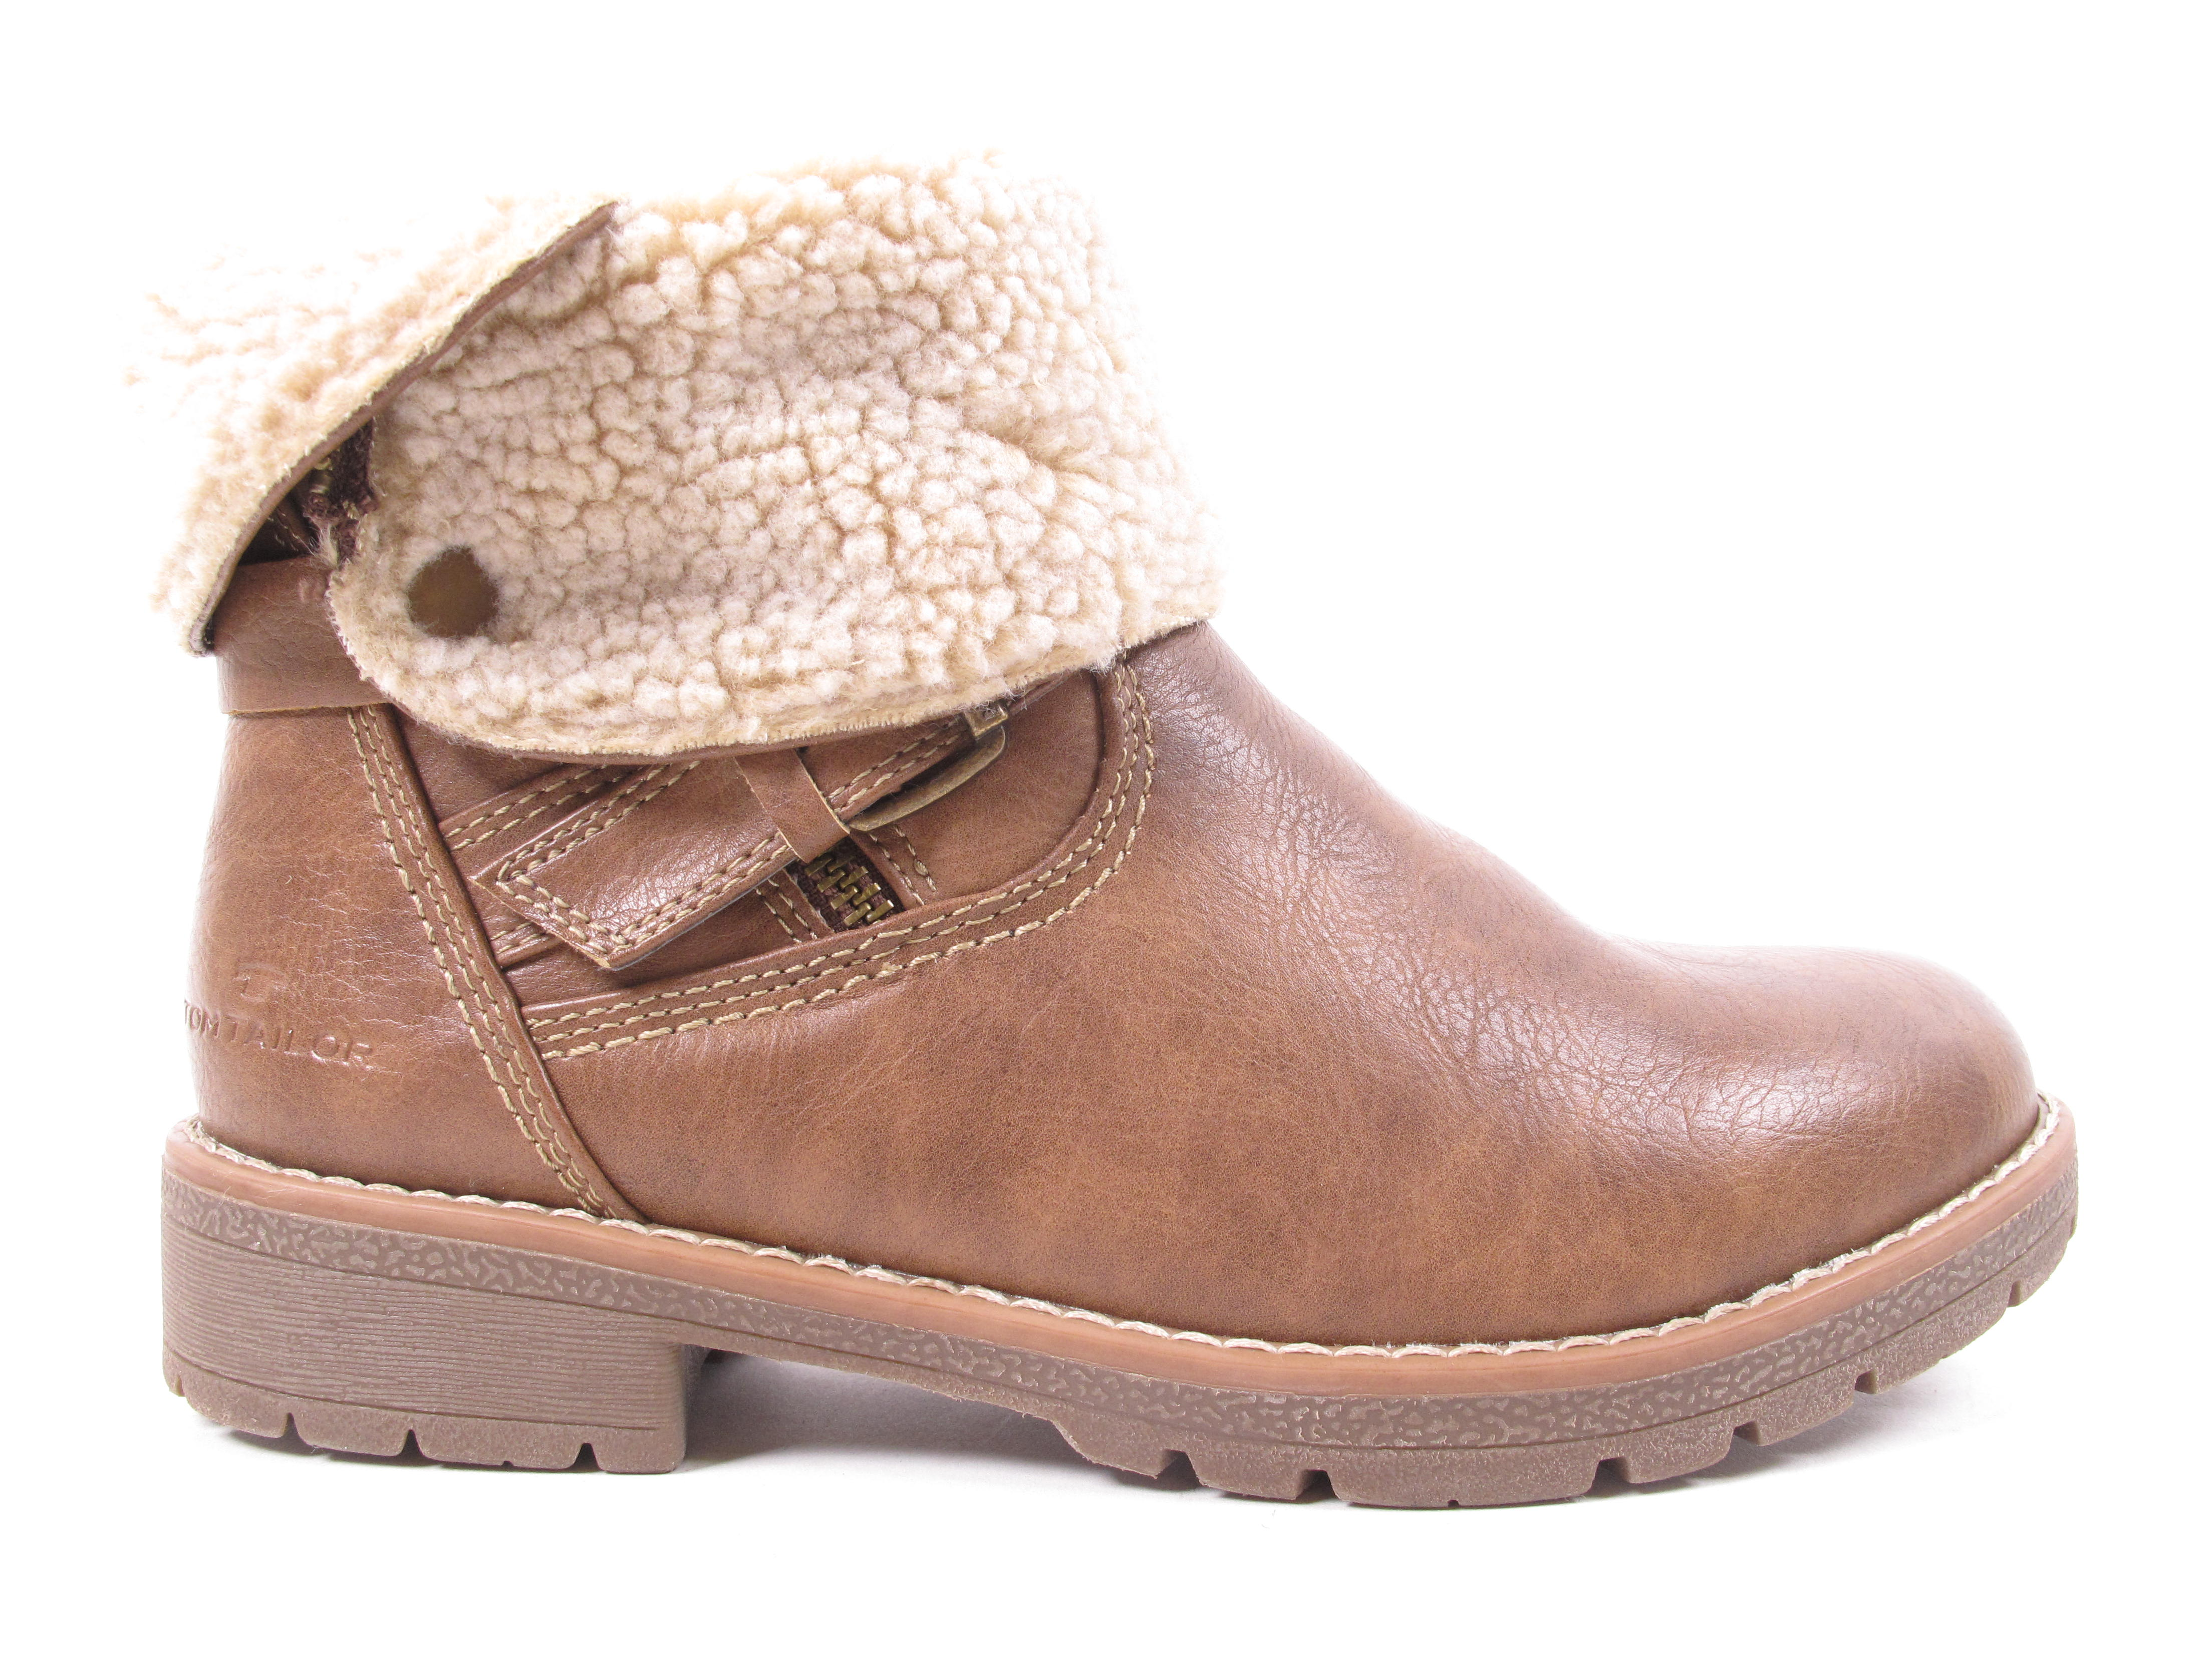 tom tailor damen stiefel boots winterschuhe 5892007 braun. Black Bedroom Furniture Sets. Home Design Ideas